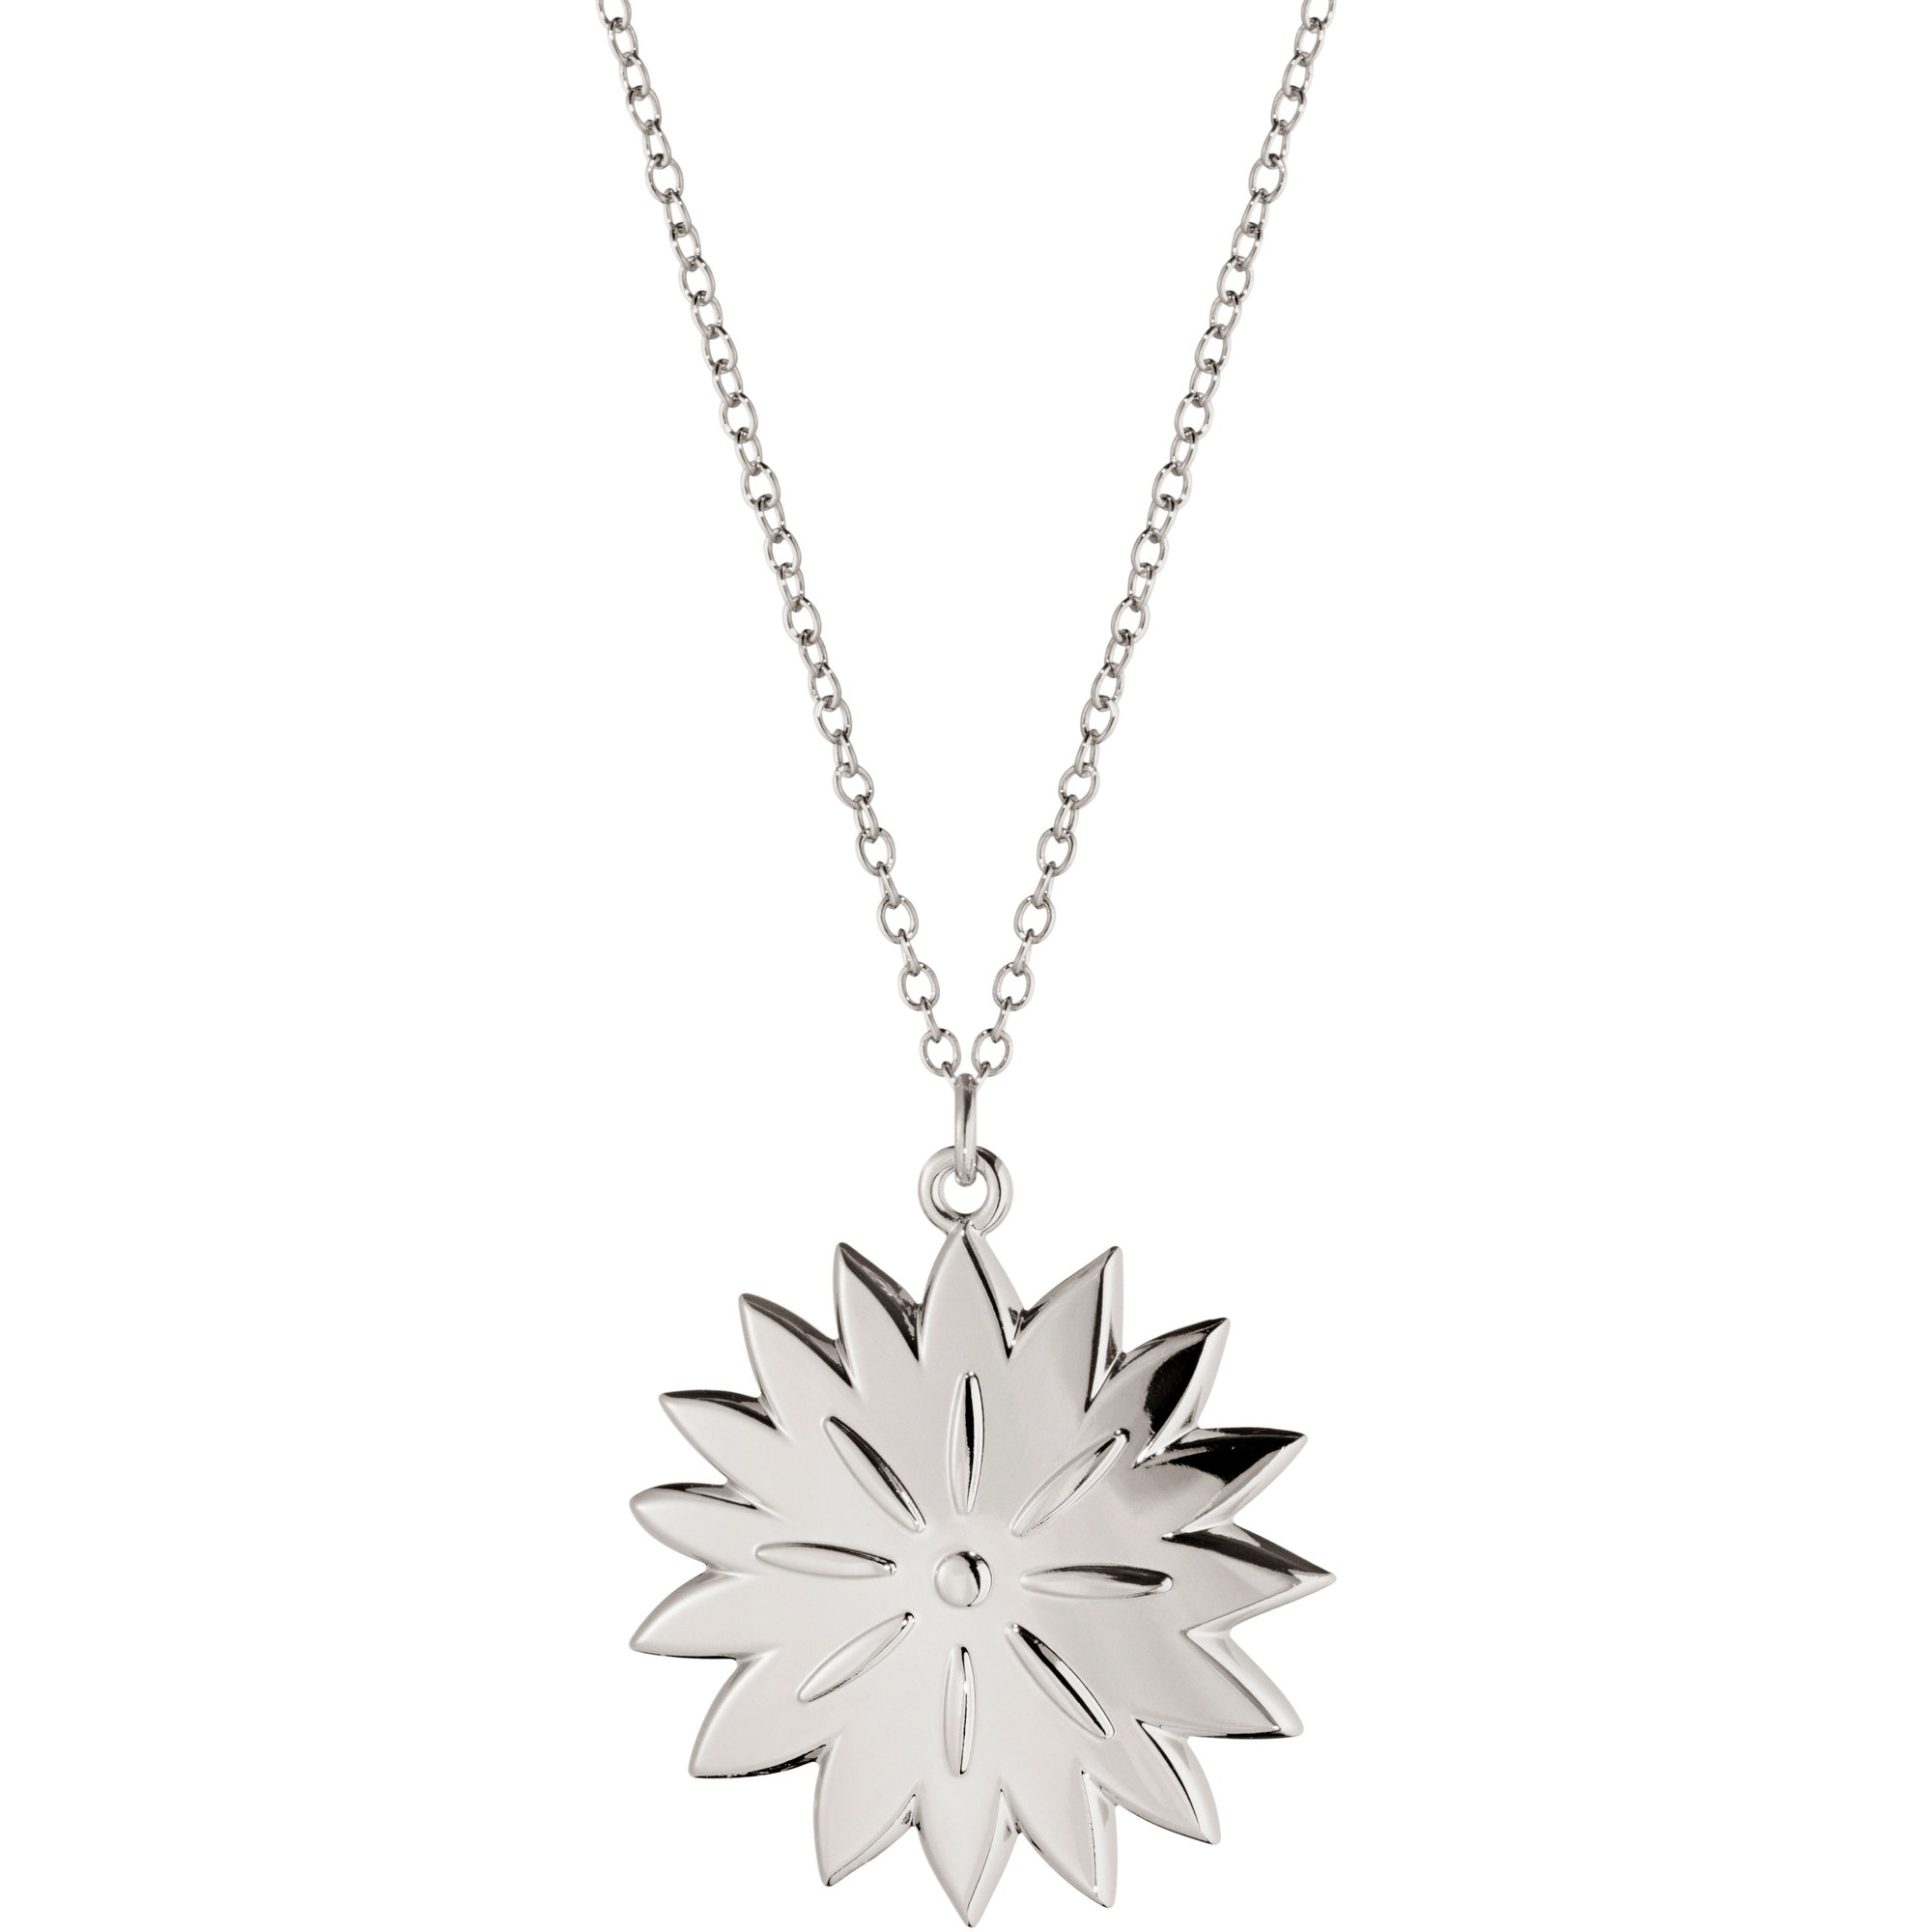 Georg Jensen 2020 Ornament Ice Dianthus palladium